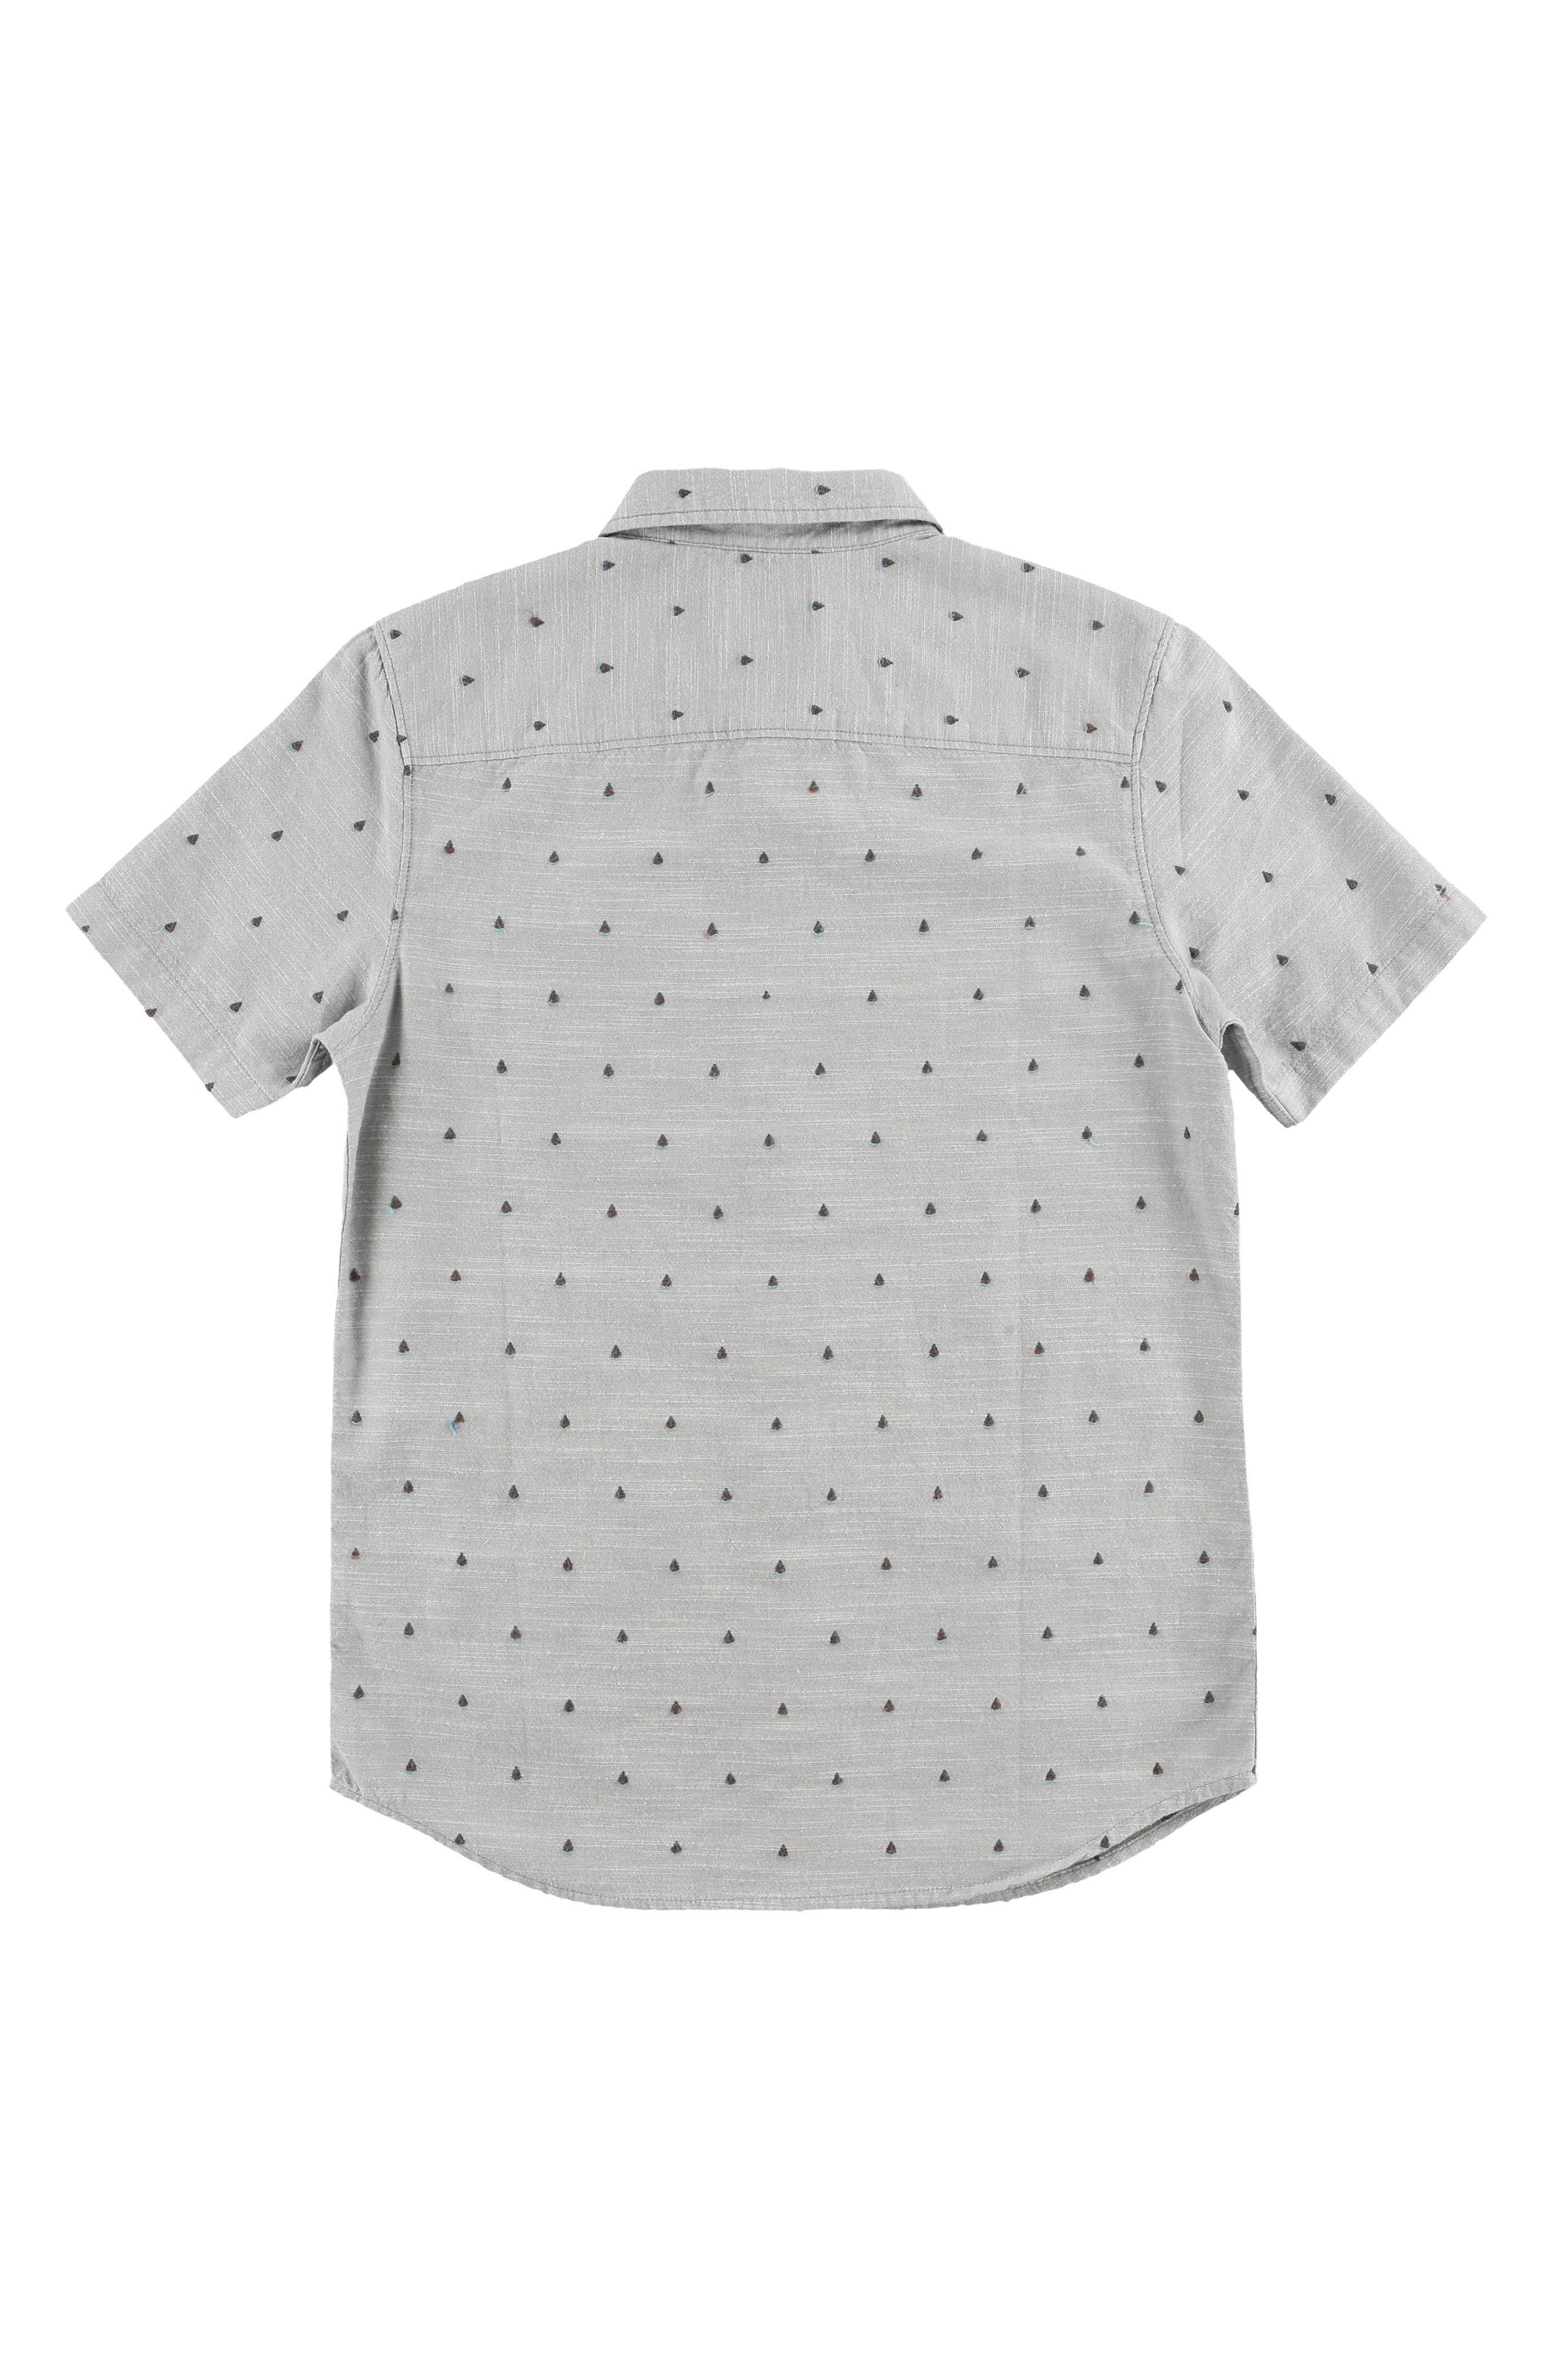 O'NEILL,                             Woods Woven Shirt,                             Alternate thumbnail 2, color,                             GREY